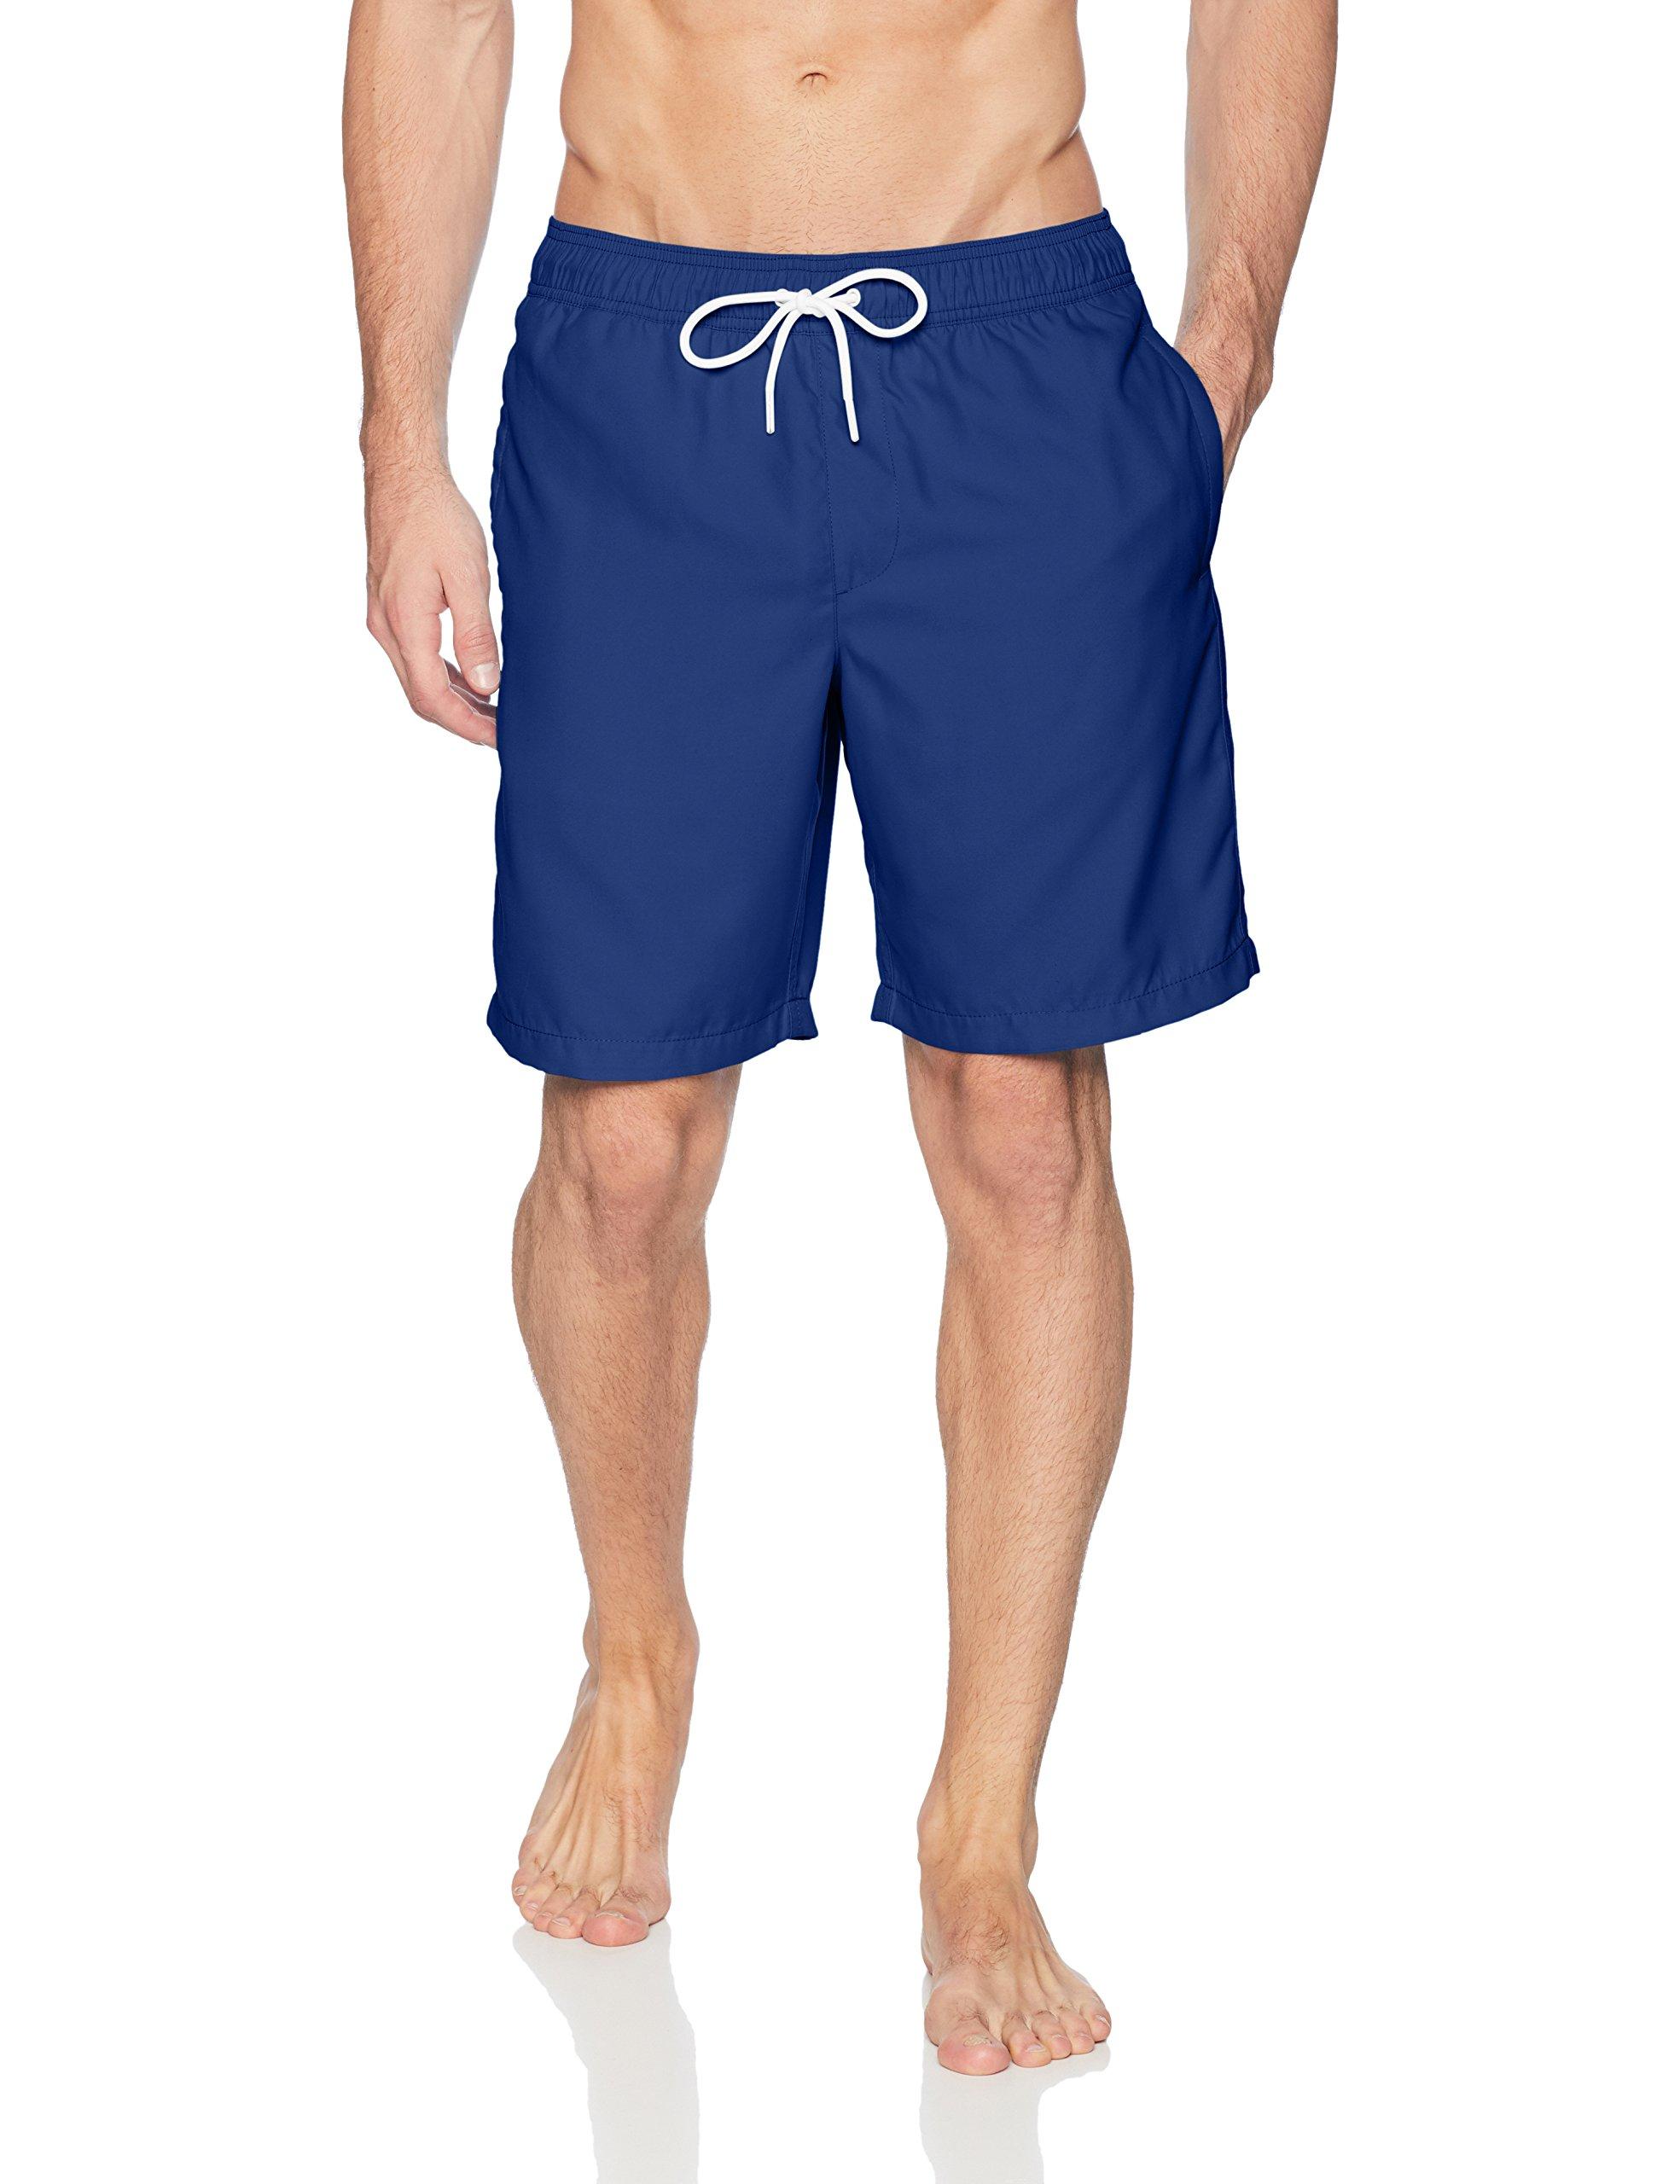 Amazon Essentials Men's Quick-Dry 9'' Swim Trunk, Navy, Large